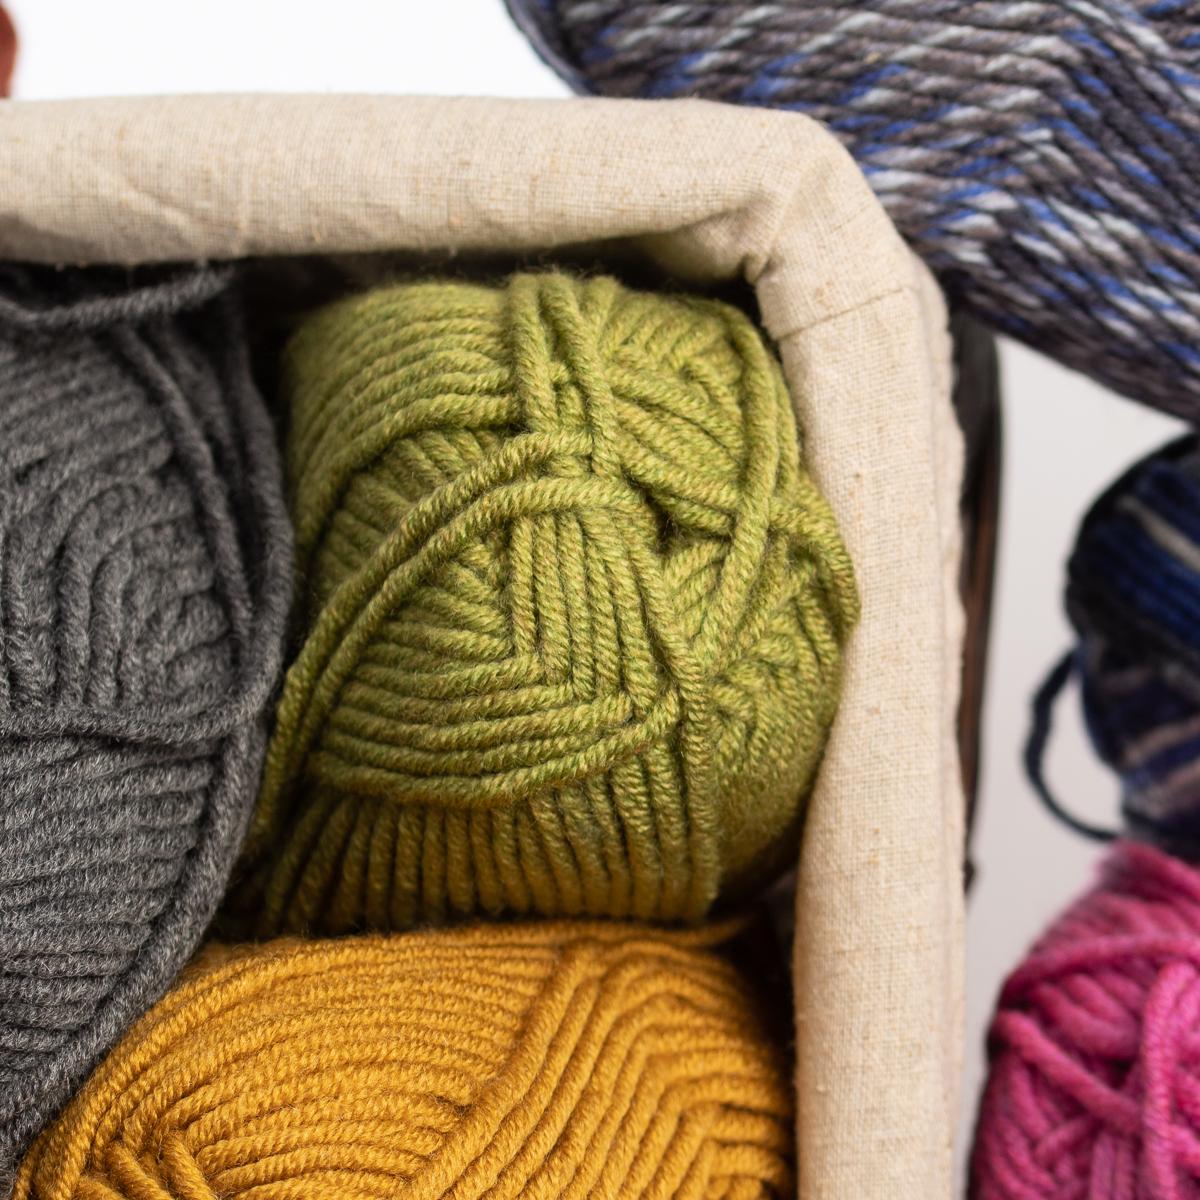 3pk-Lion-Brand-Woolspun-Acrylic-amp-Wool-Yarn-Bulky-5-Knit-Crocheting-Skeins-Soft thumbnail 18